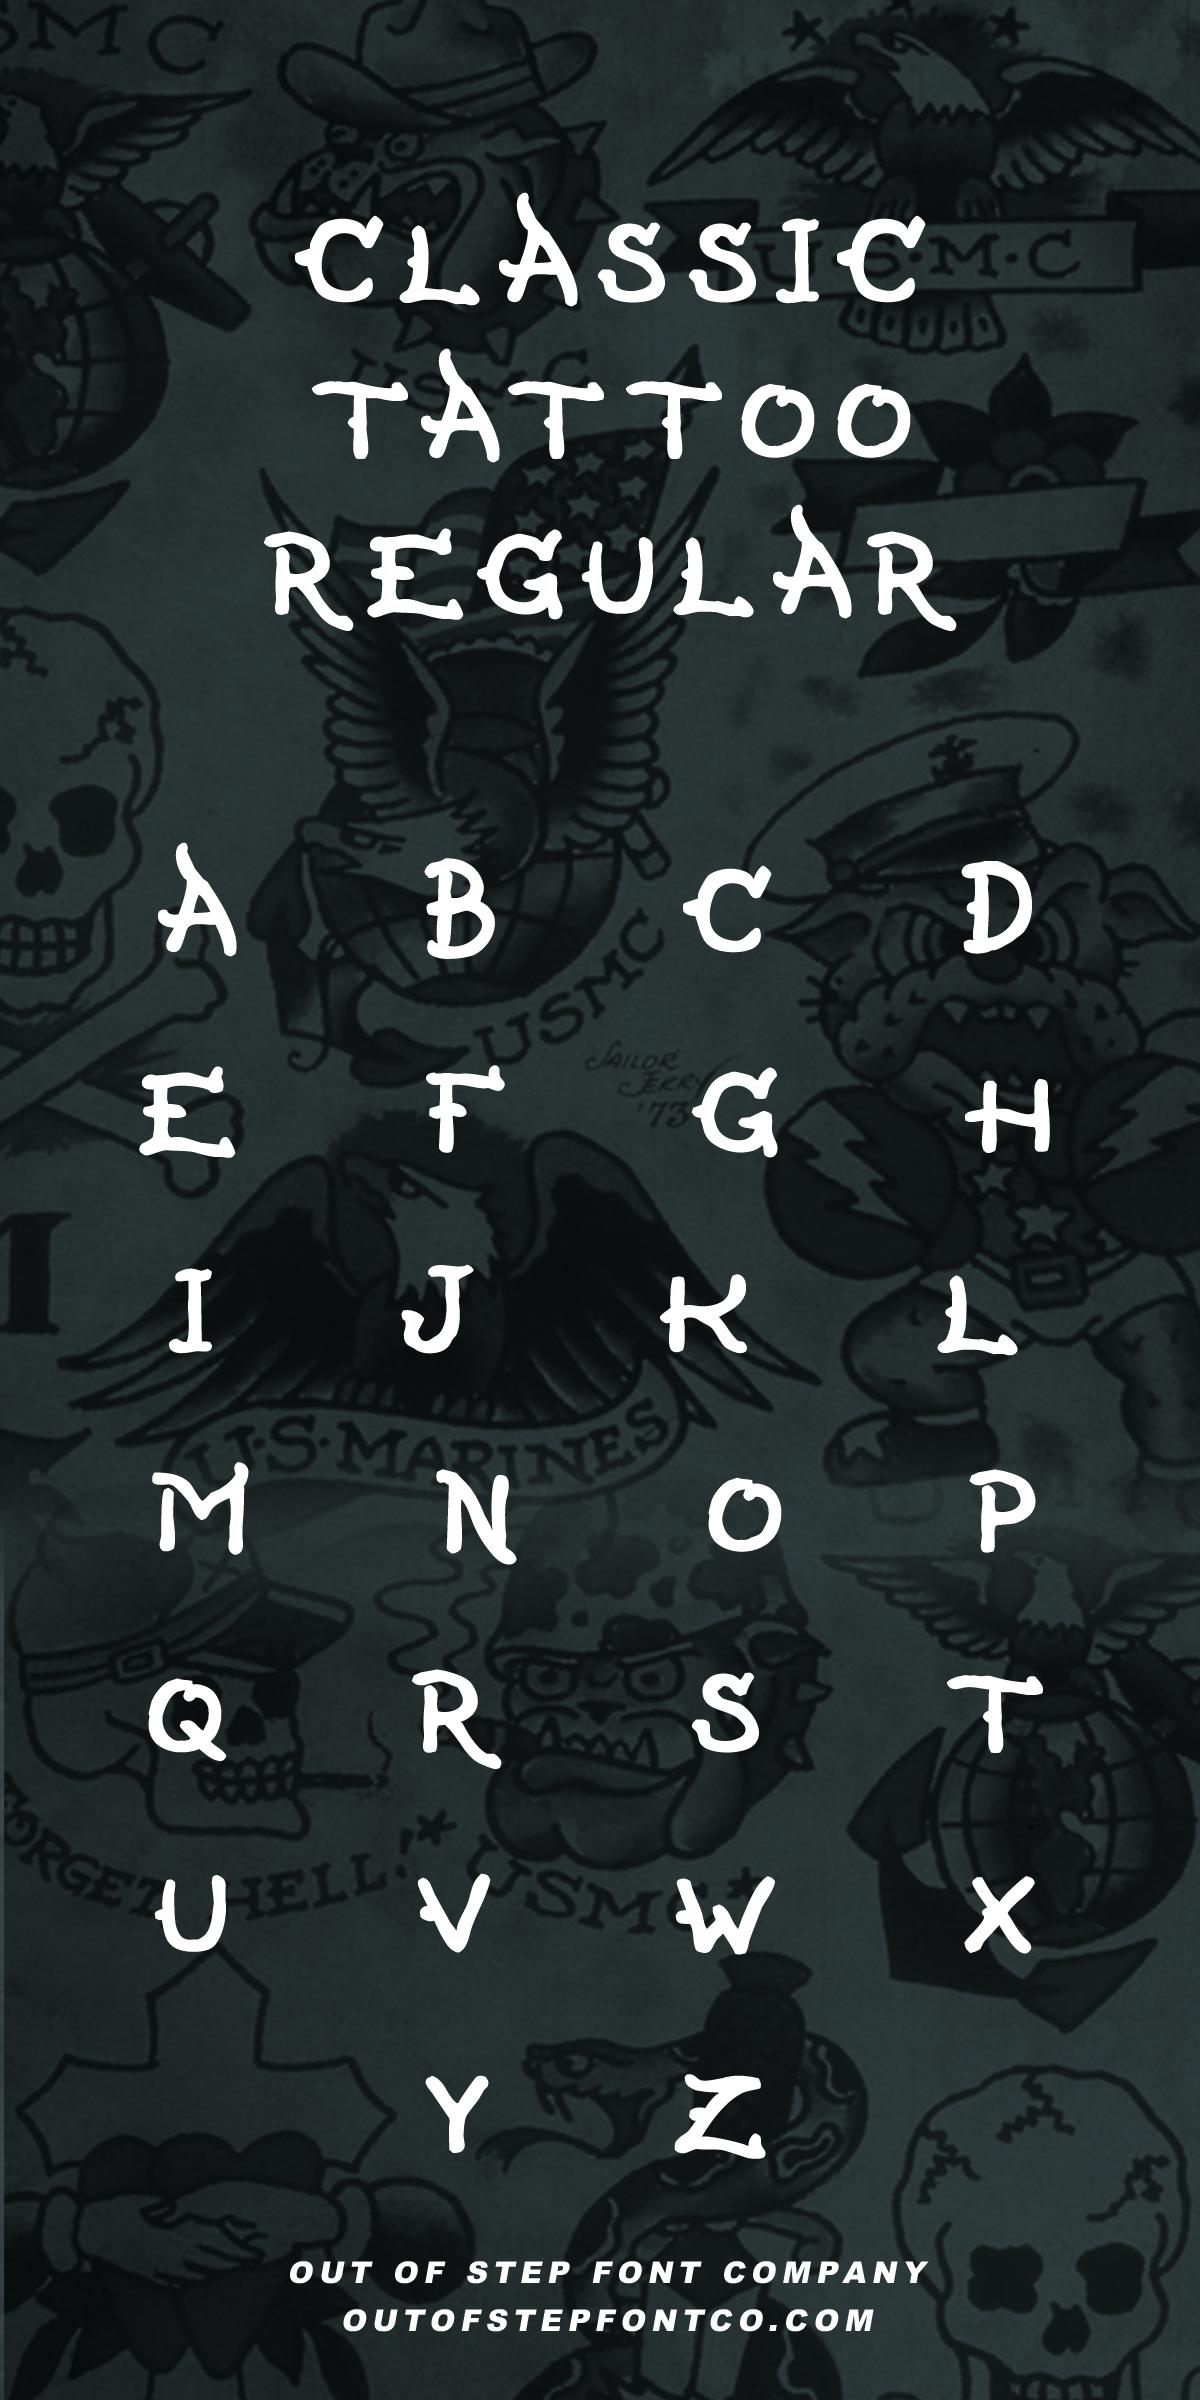 Tattoo Font Collection Tattoo lettering design, Tattoo